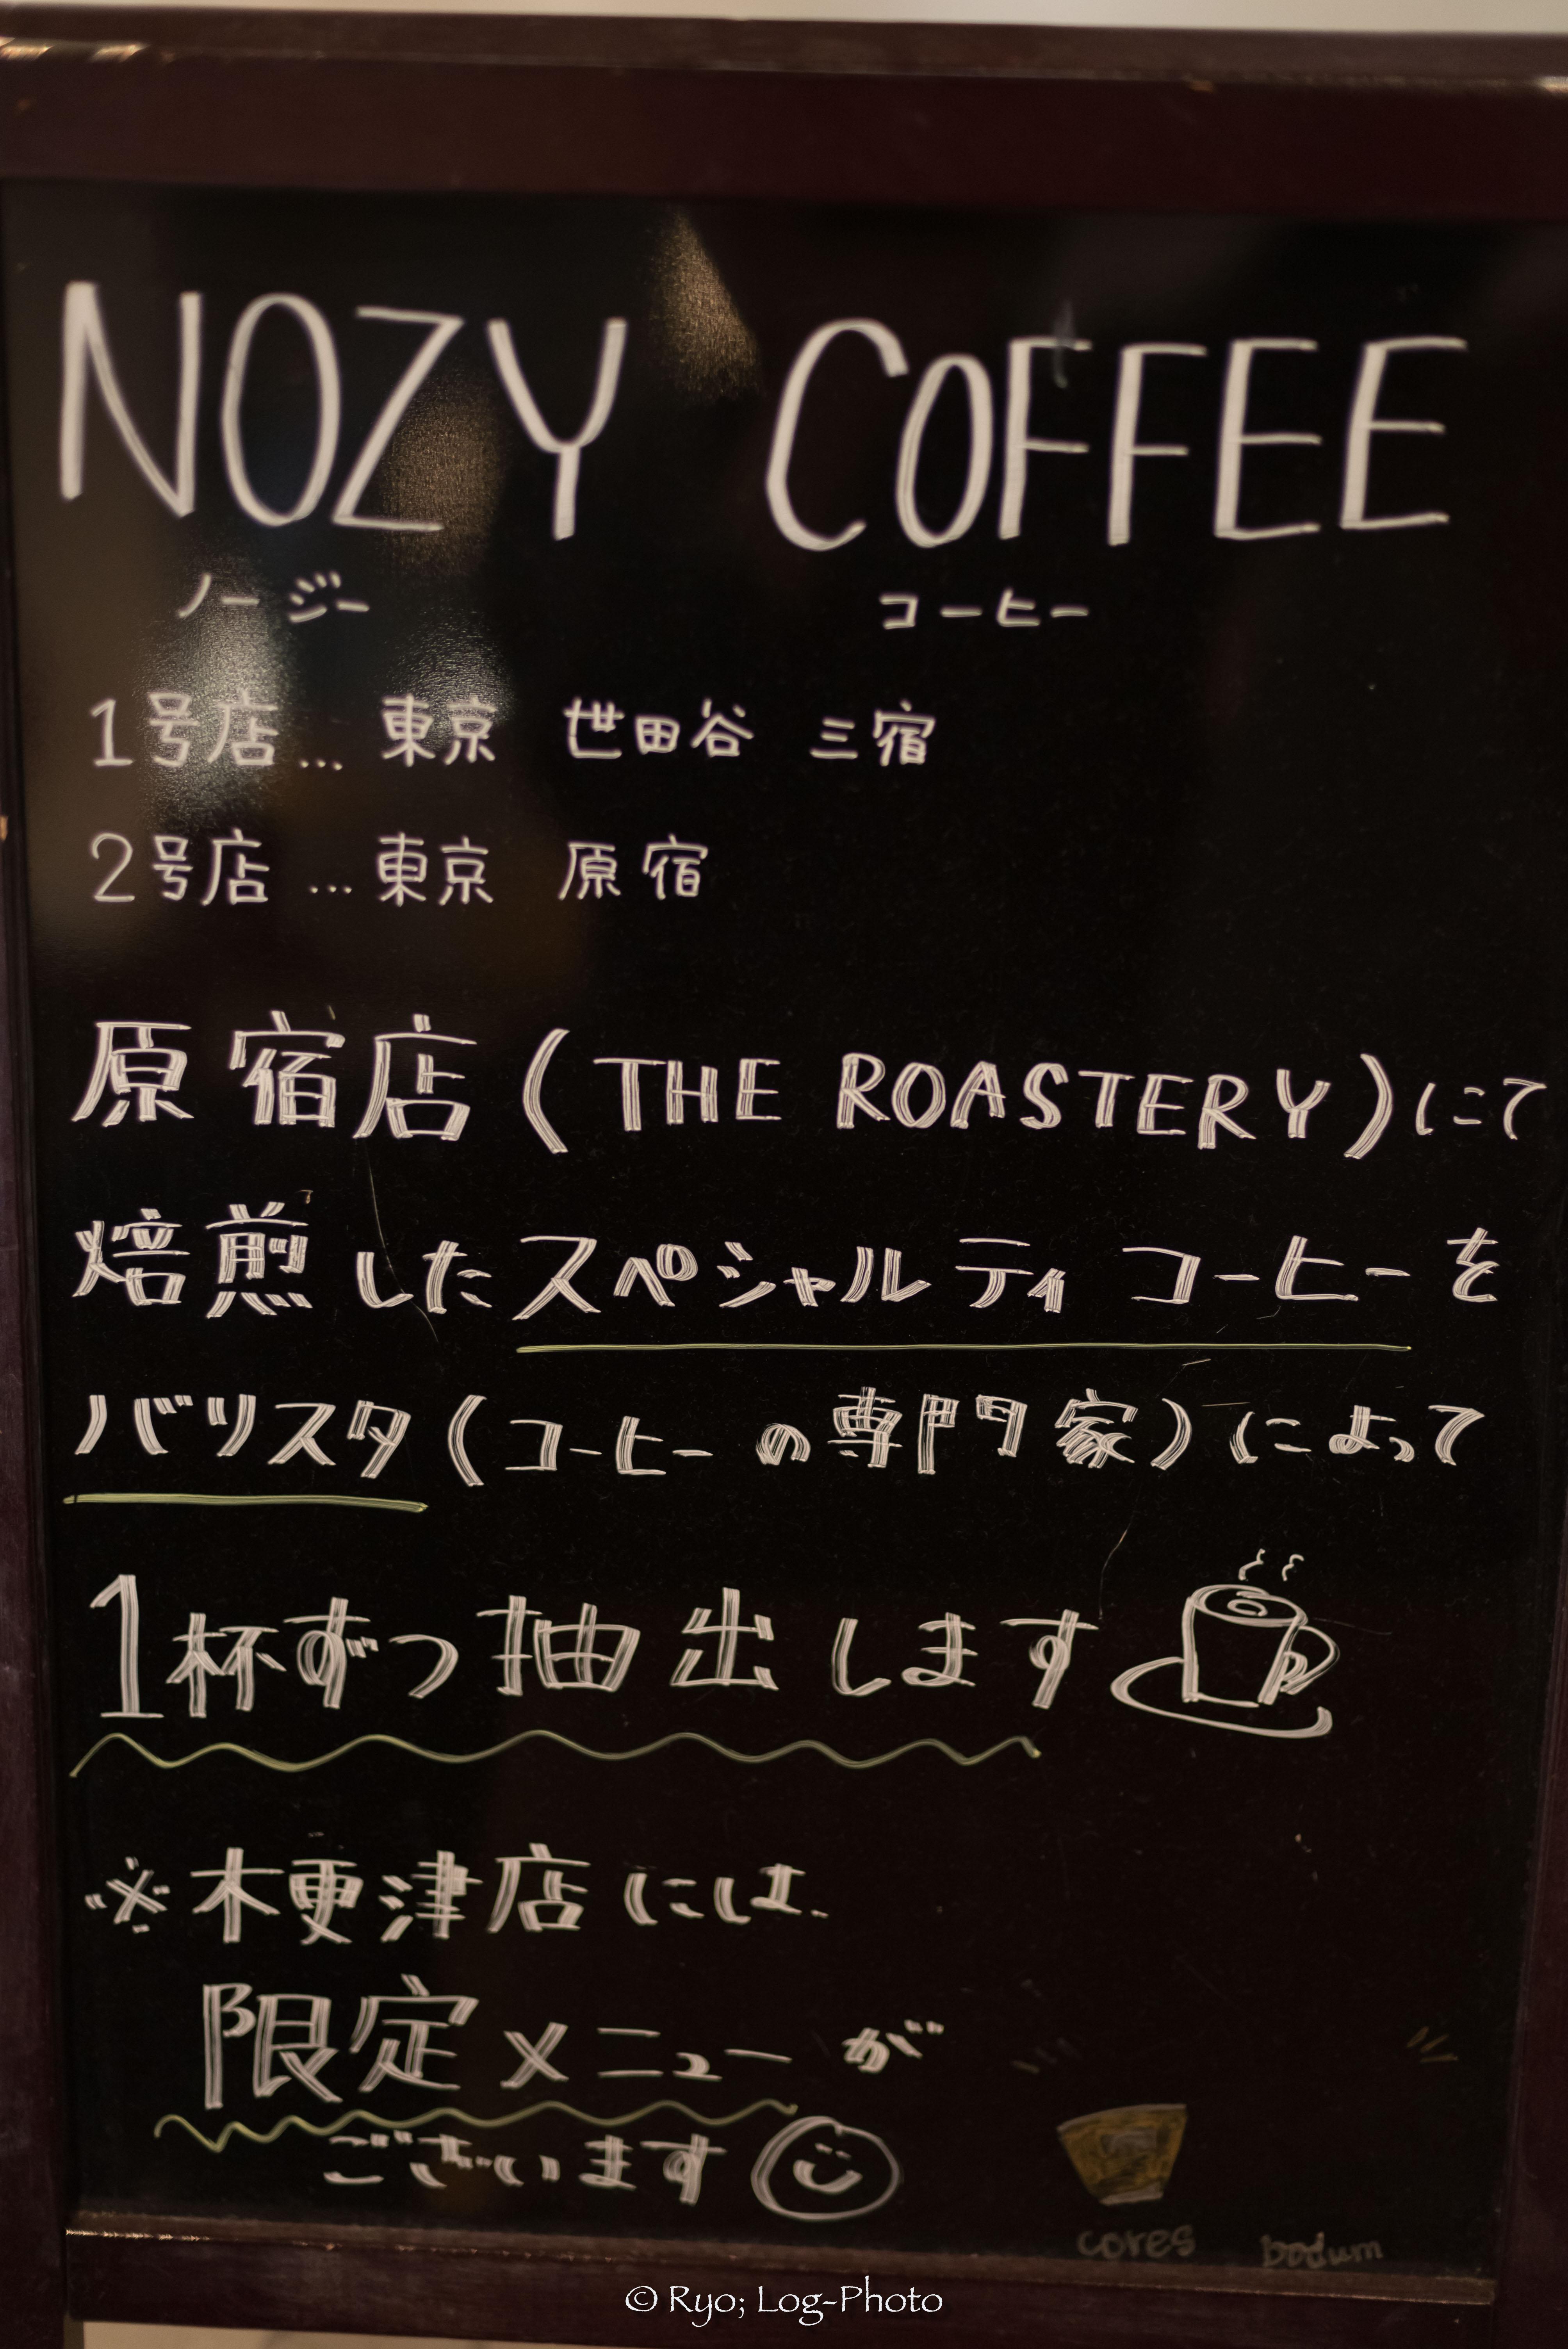 nozycoffeeノージーコーヒー木更津 店舗紹介